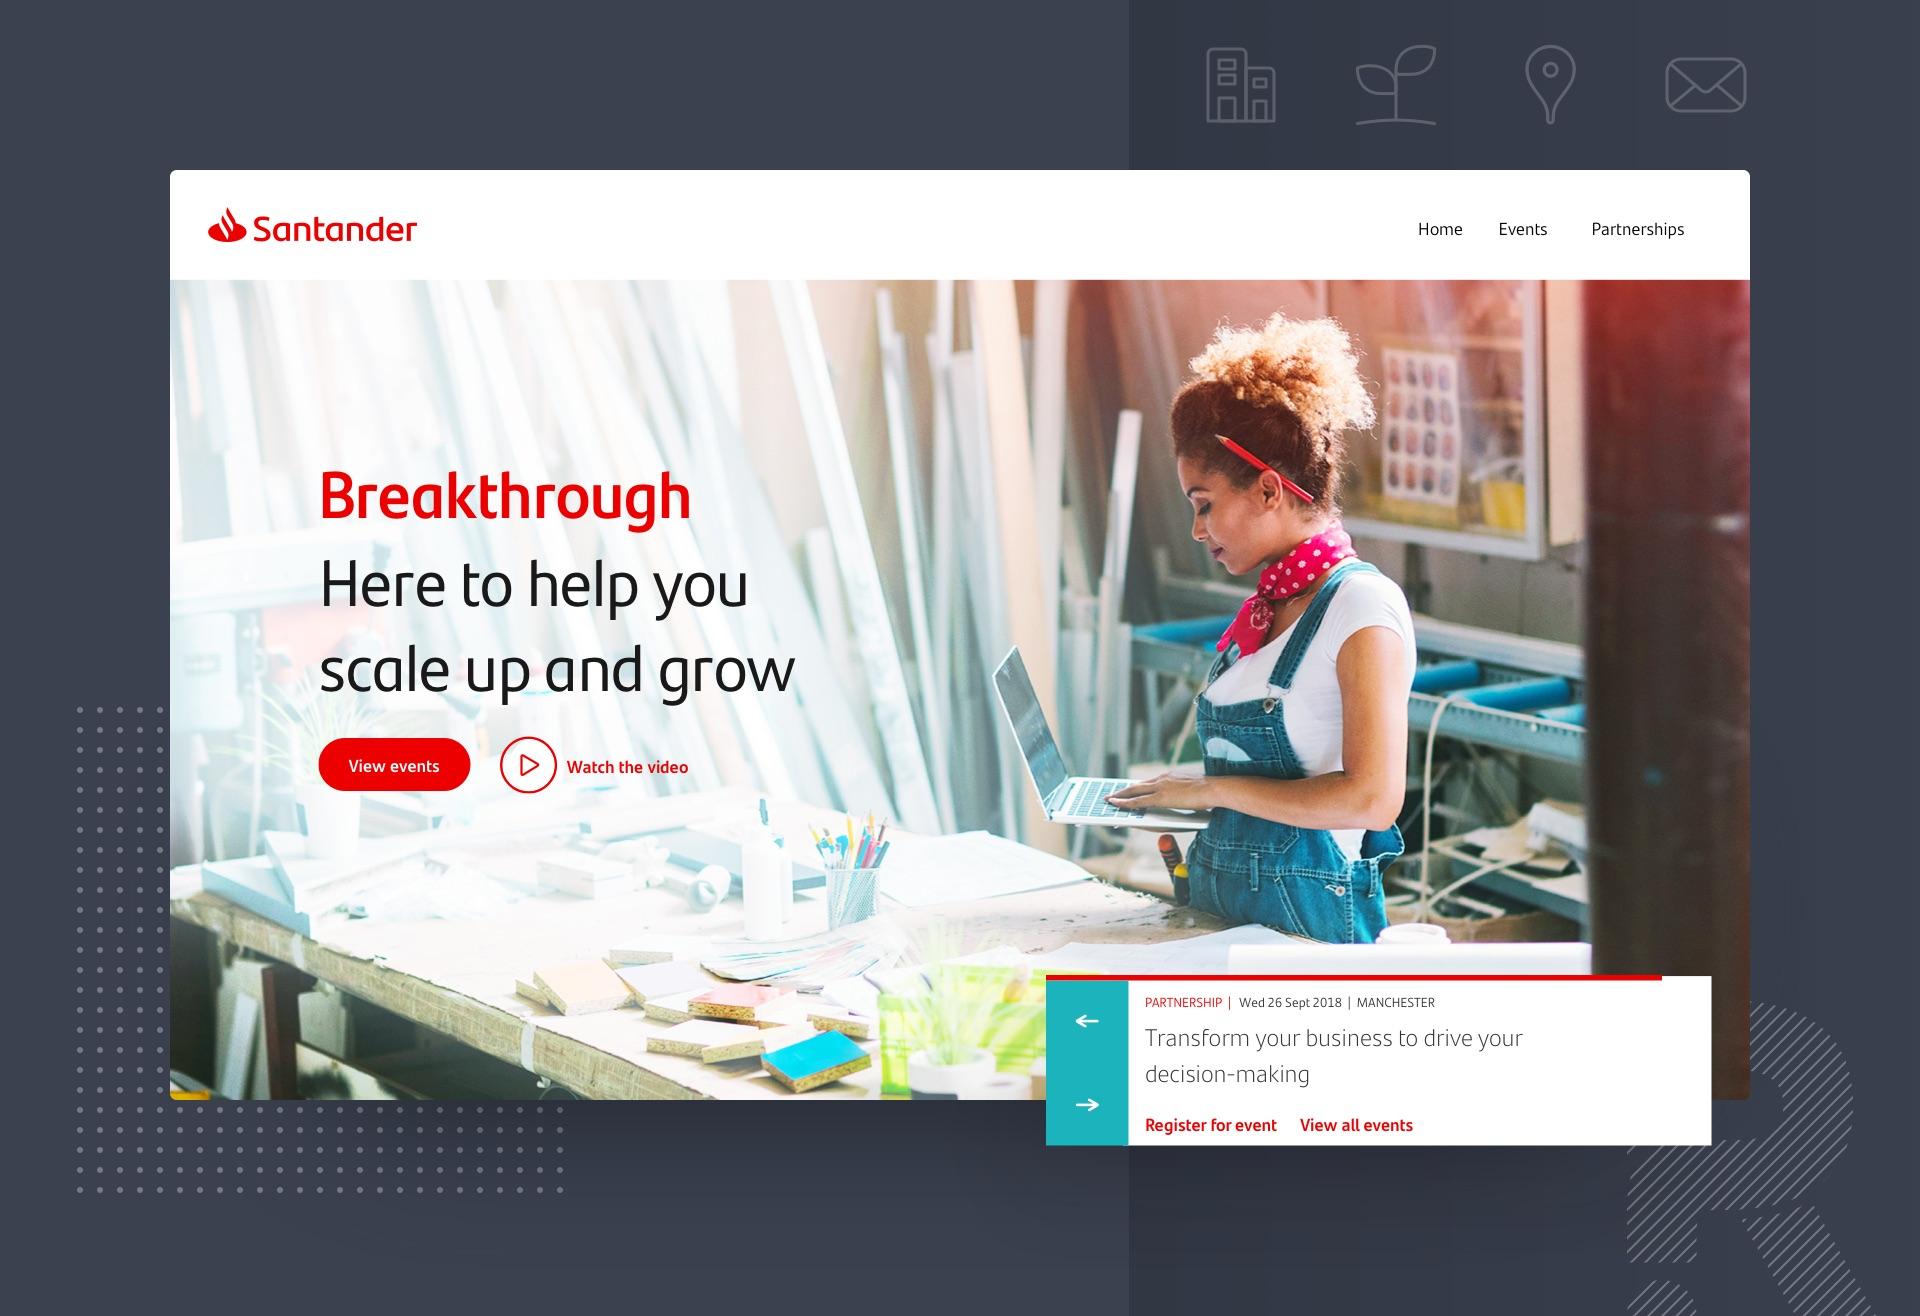 Santander Breakthrough showcase image